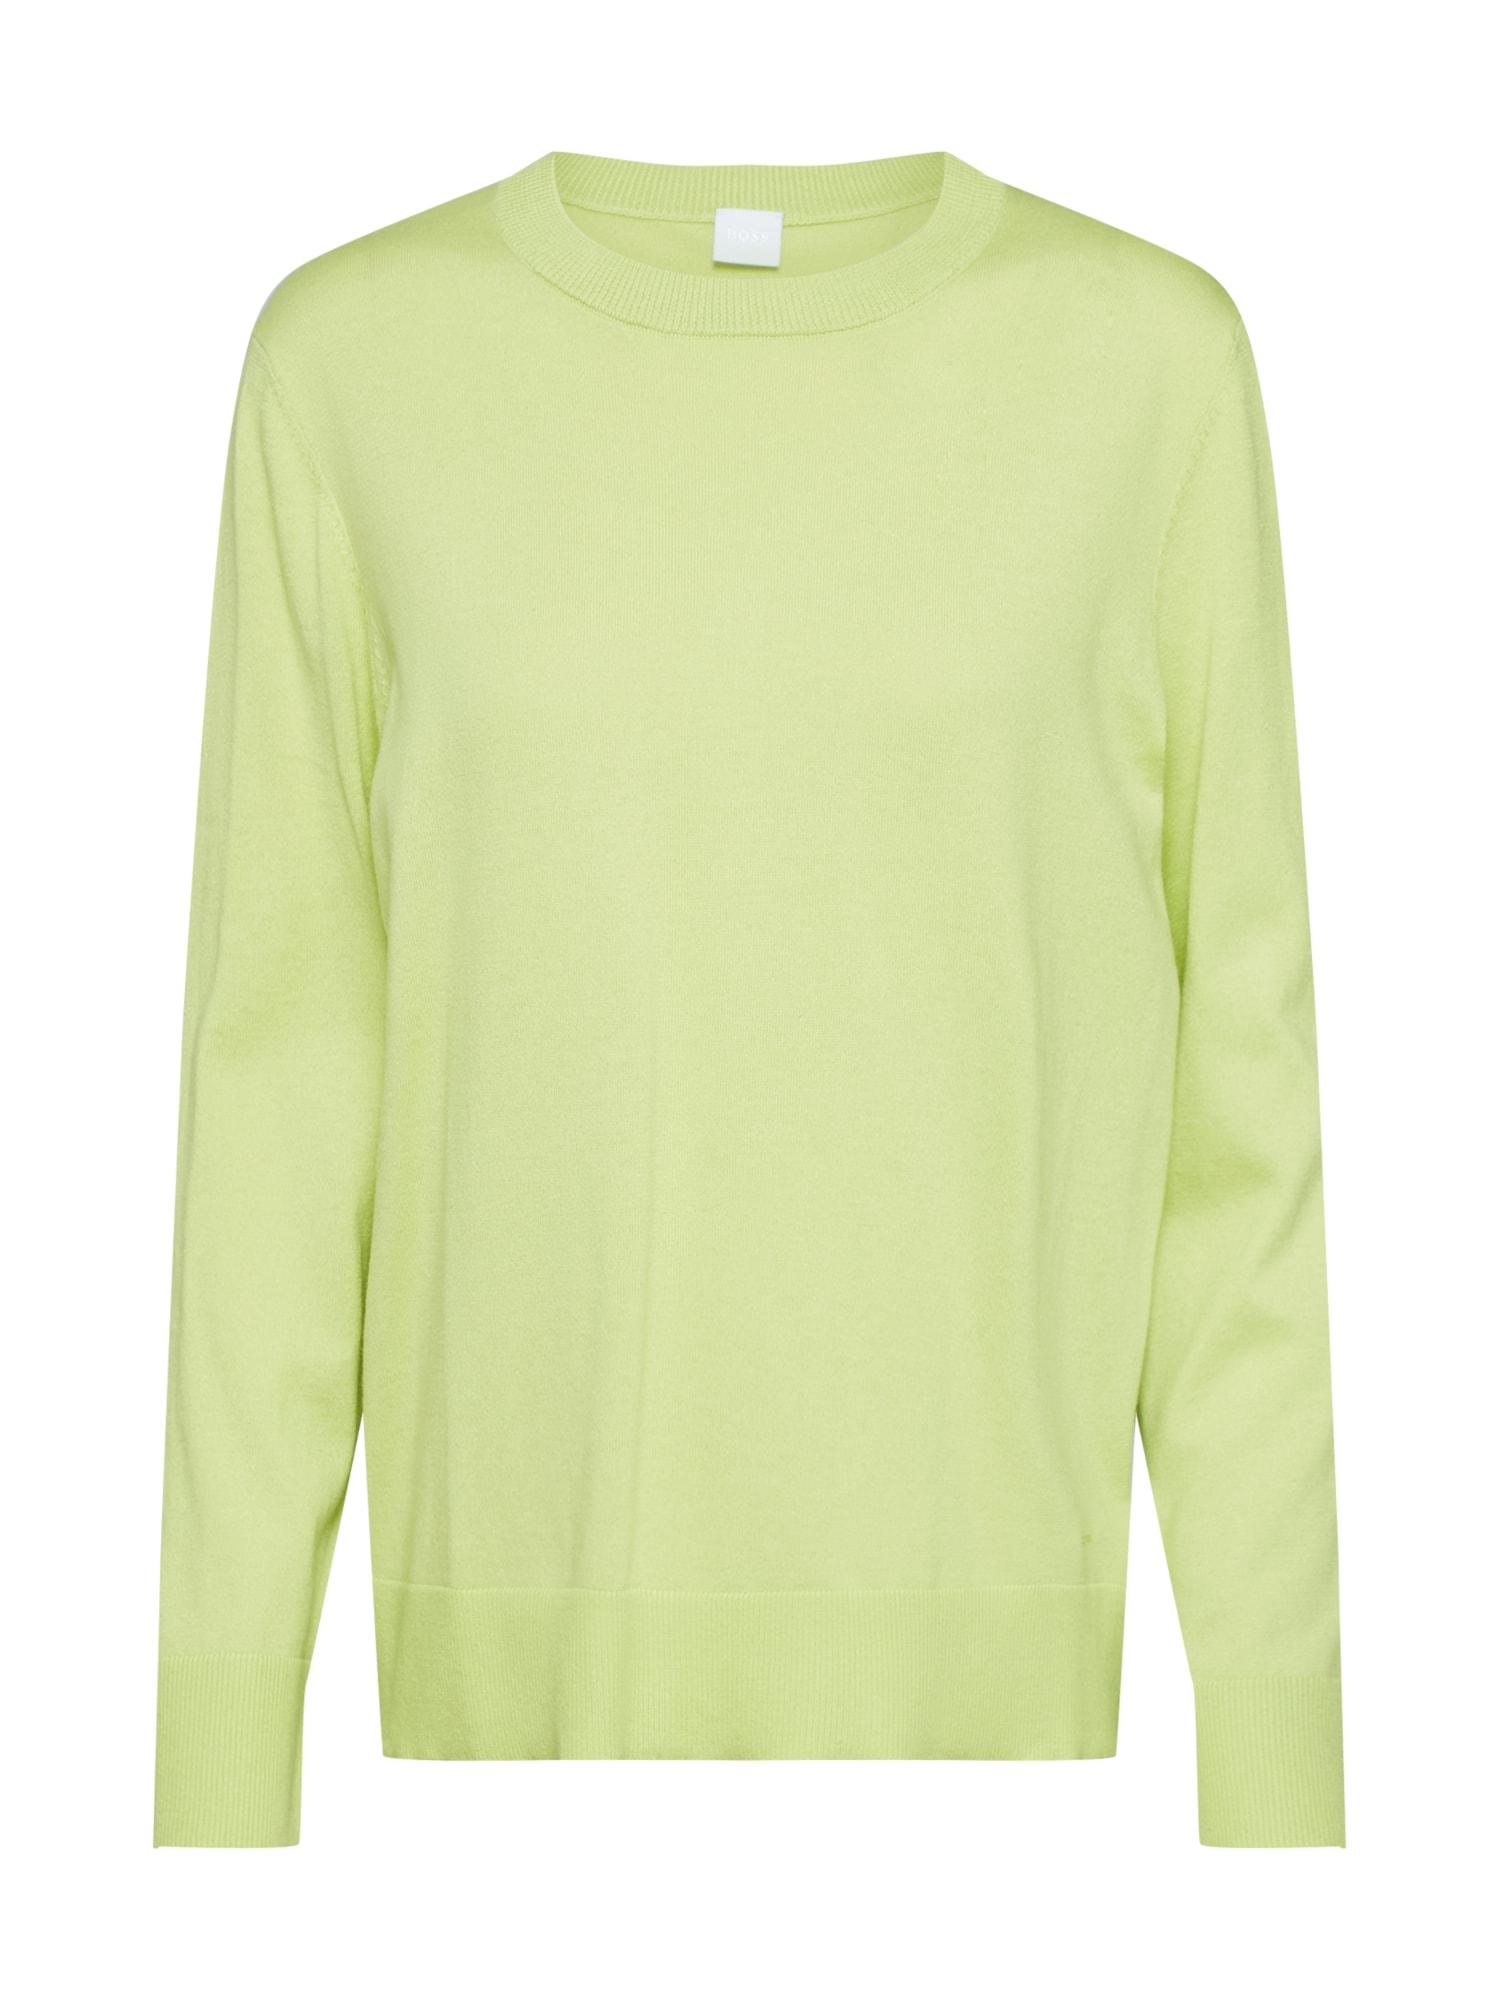 BOSS Megztinis 'Ibinna' žalia